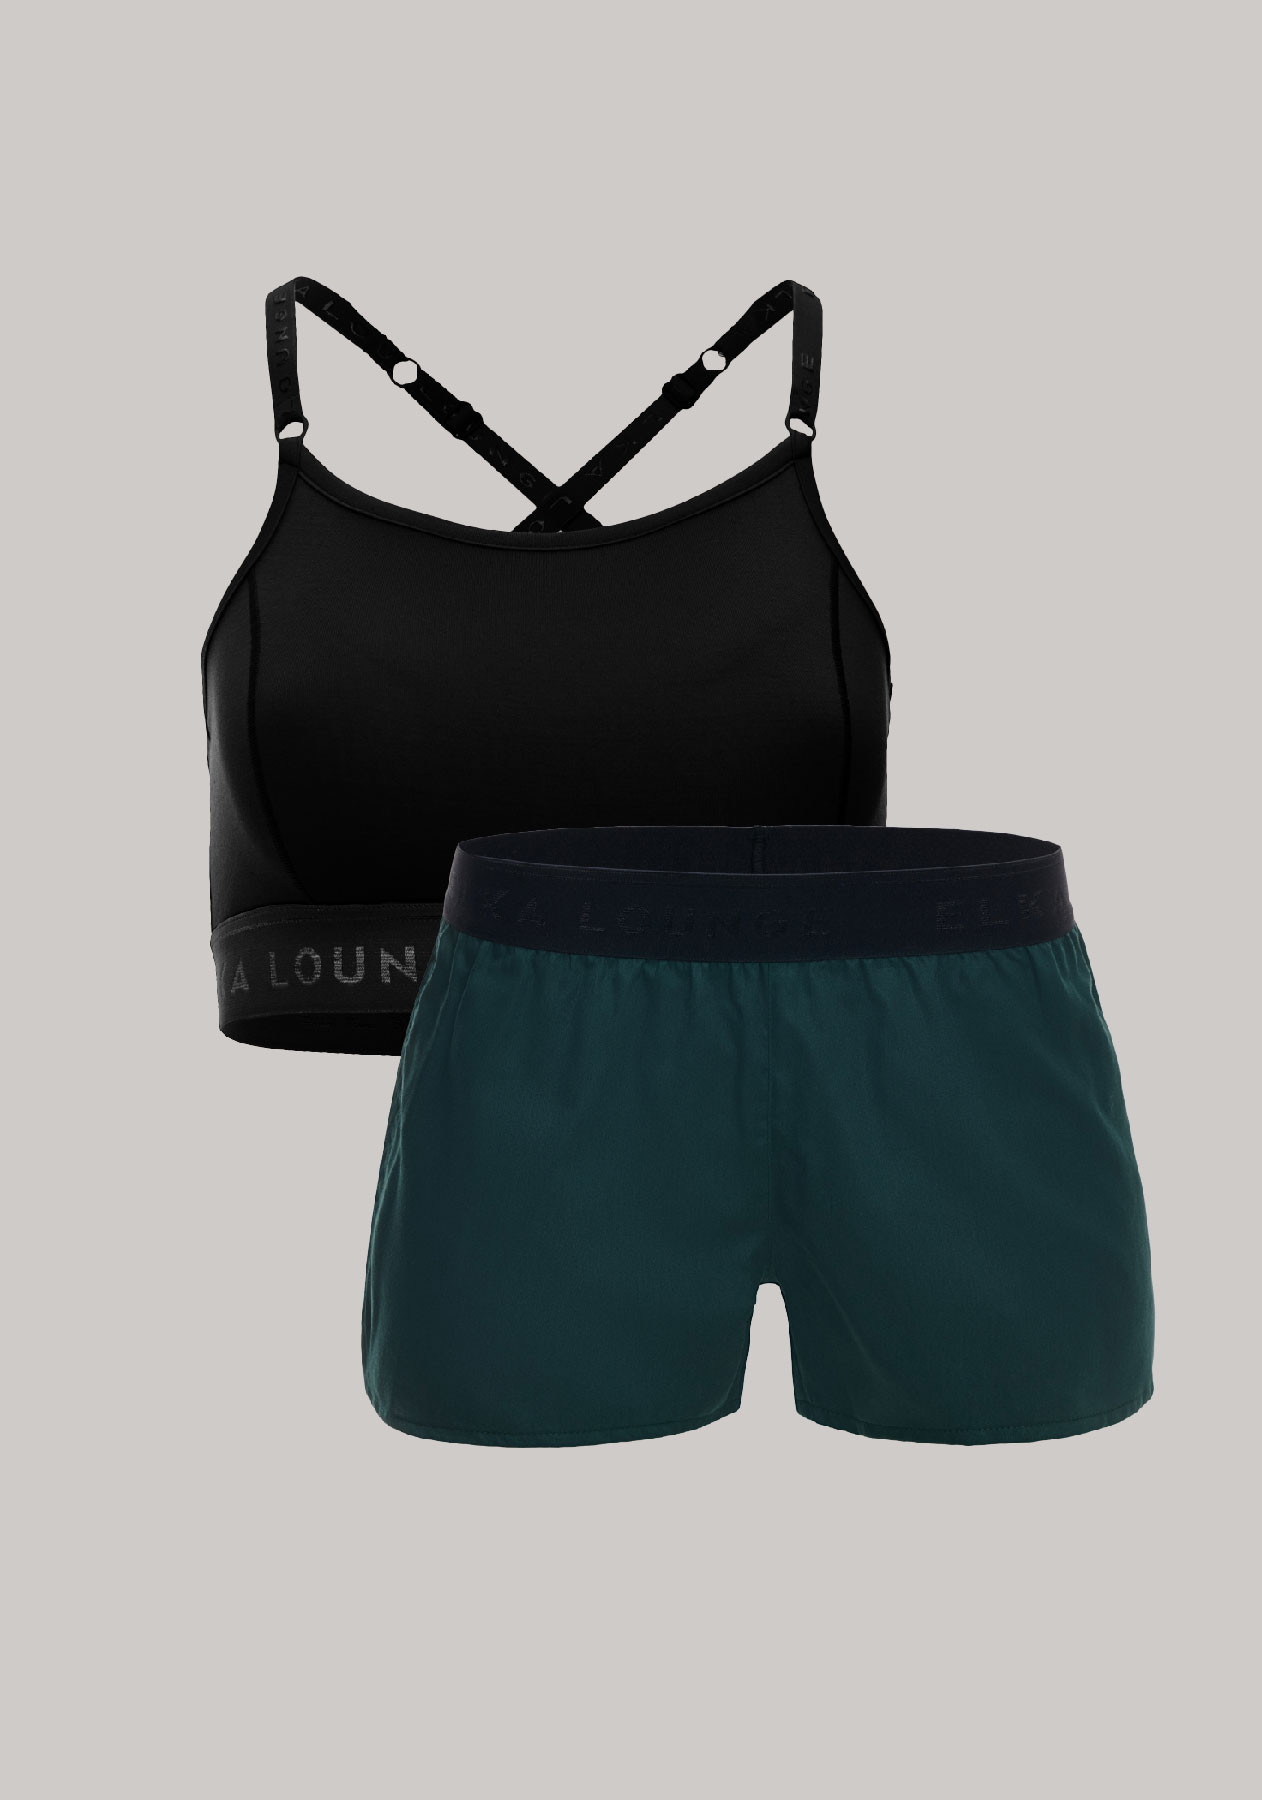 Women-boxershorts,bras-ELKA-Lounge-W00522,568